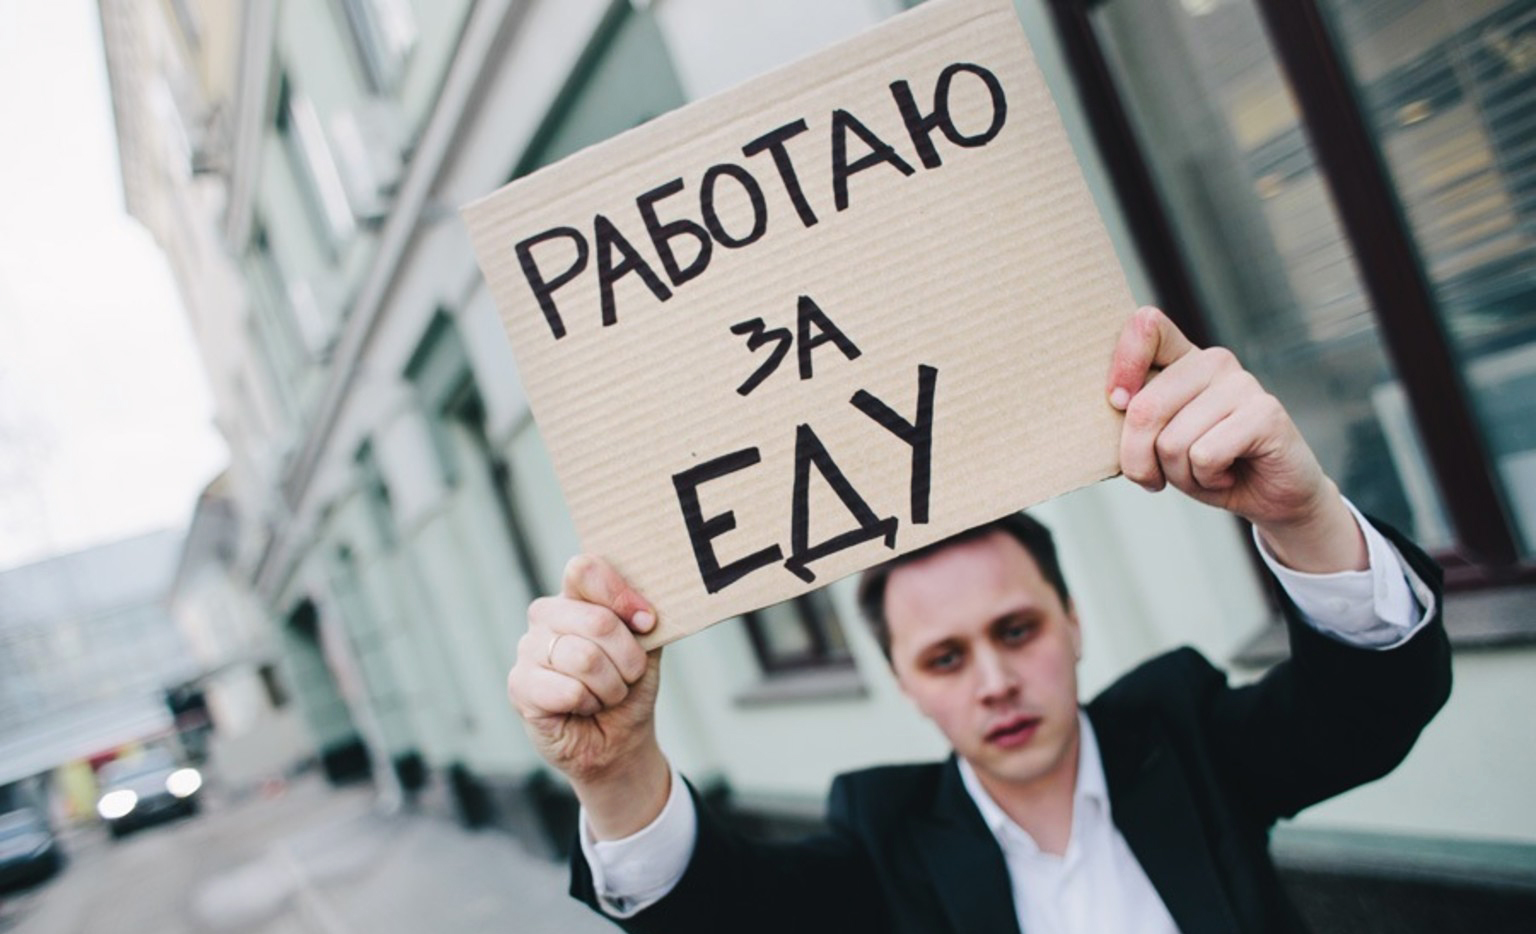 Минтруд: Безработица в РФ выросла на 16% за полмесяца